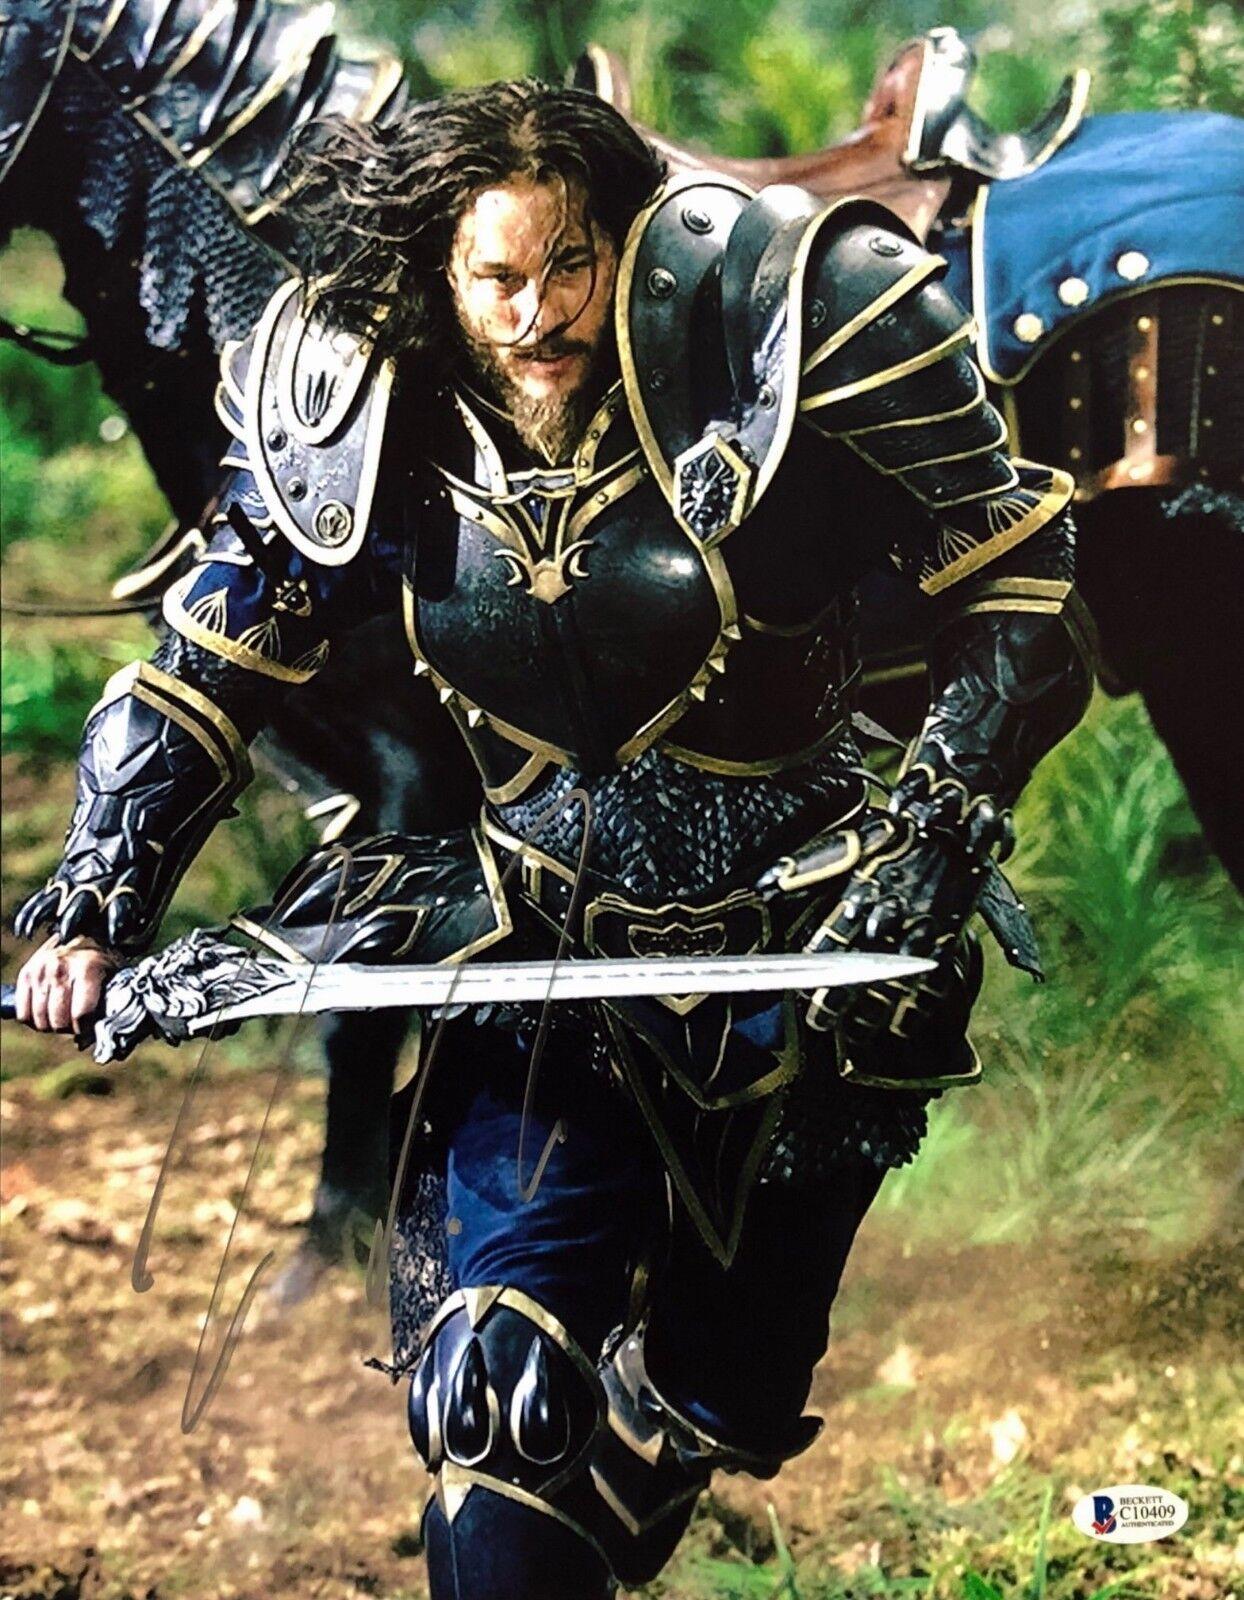 Travis Fimmel Signed Warcraft 11x14 Photo BAS C10409